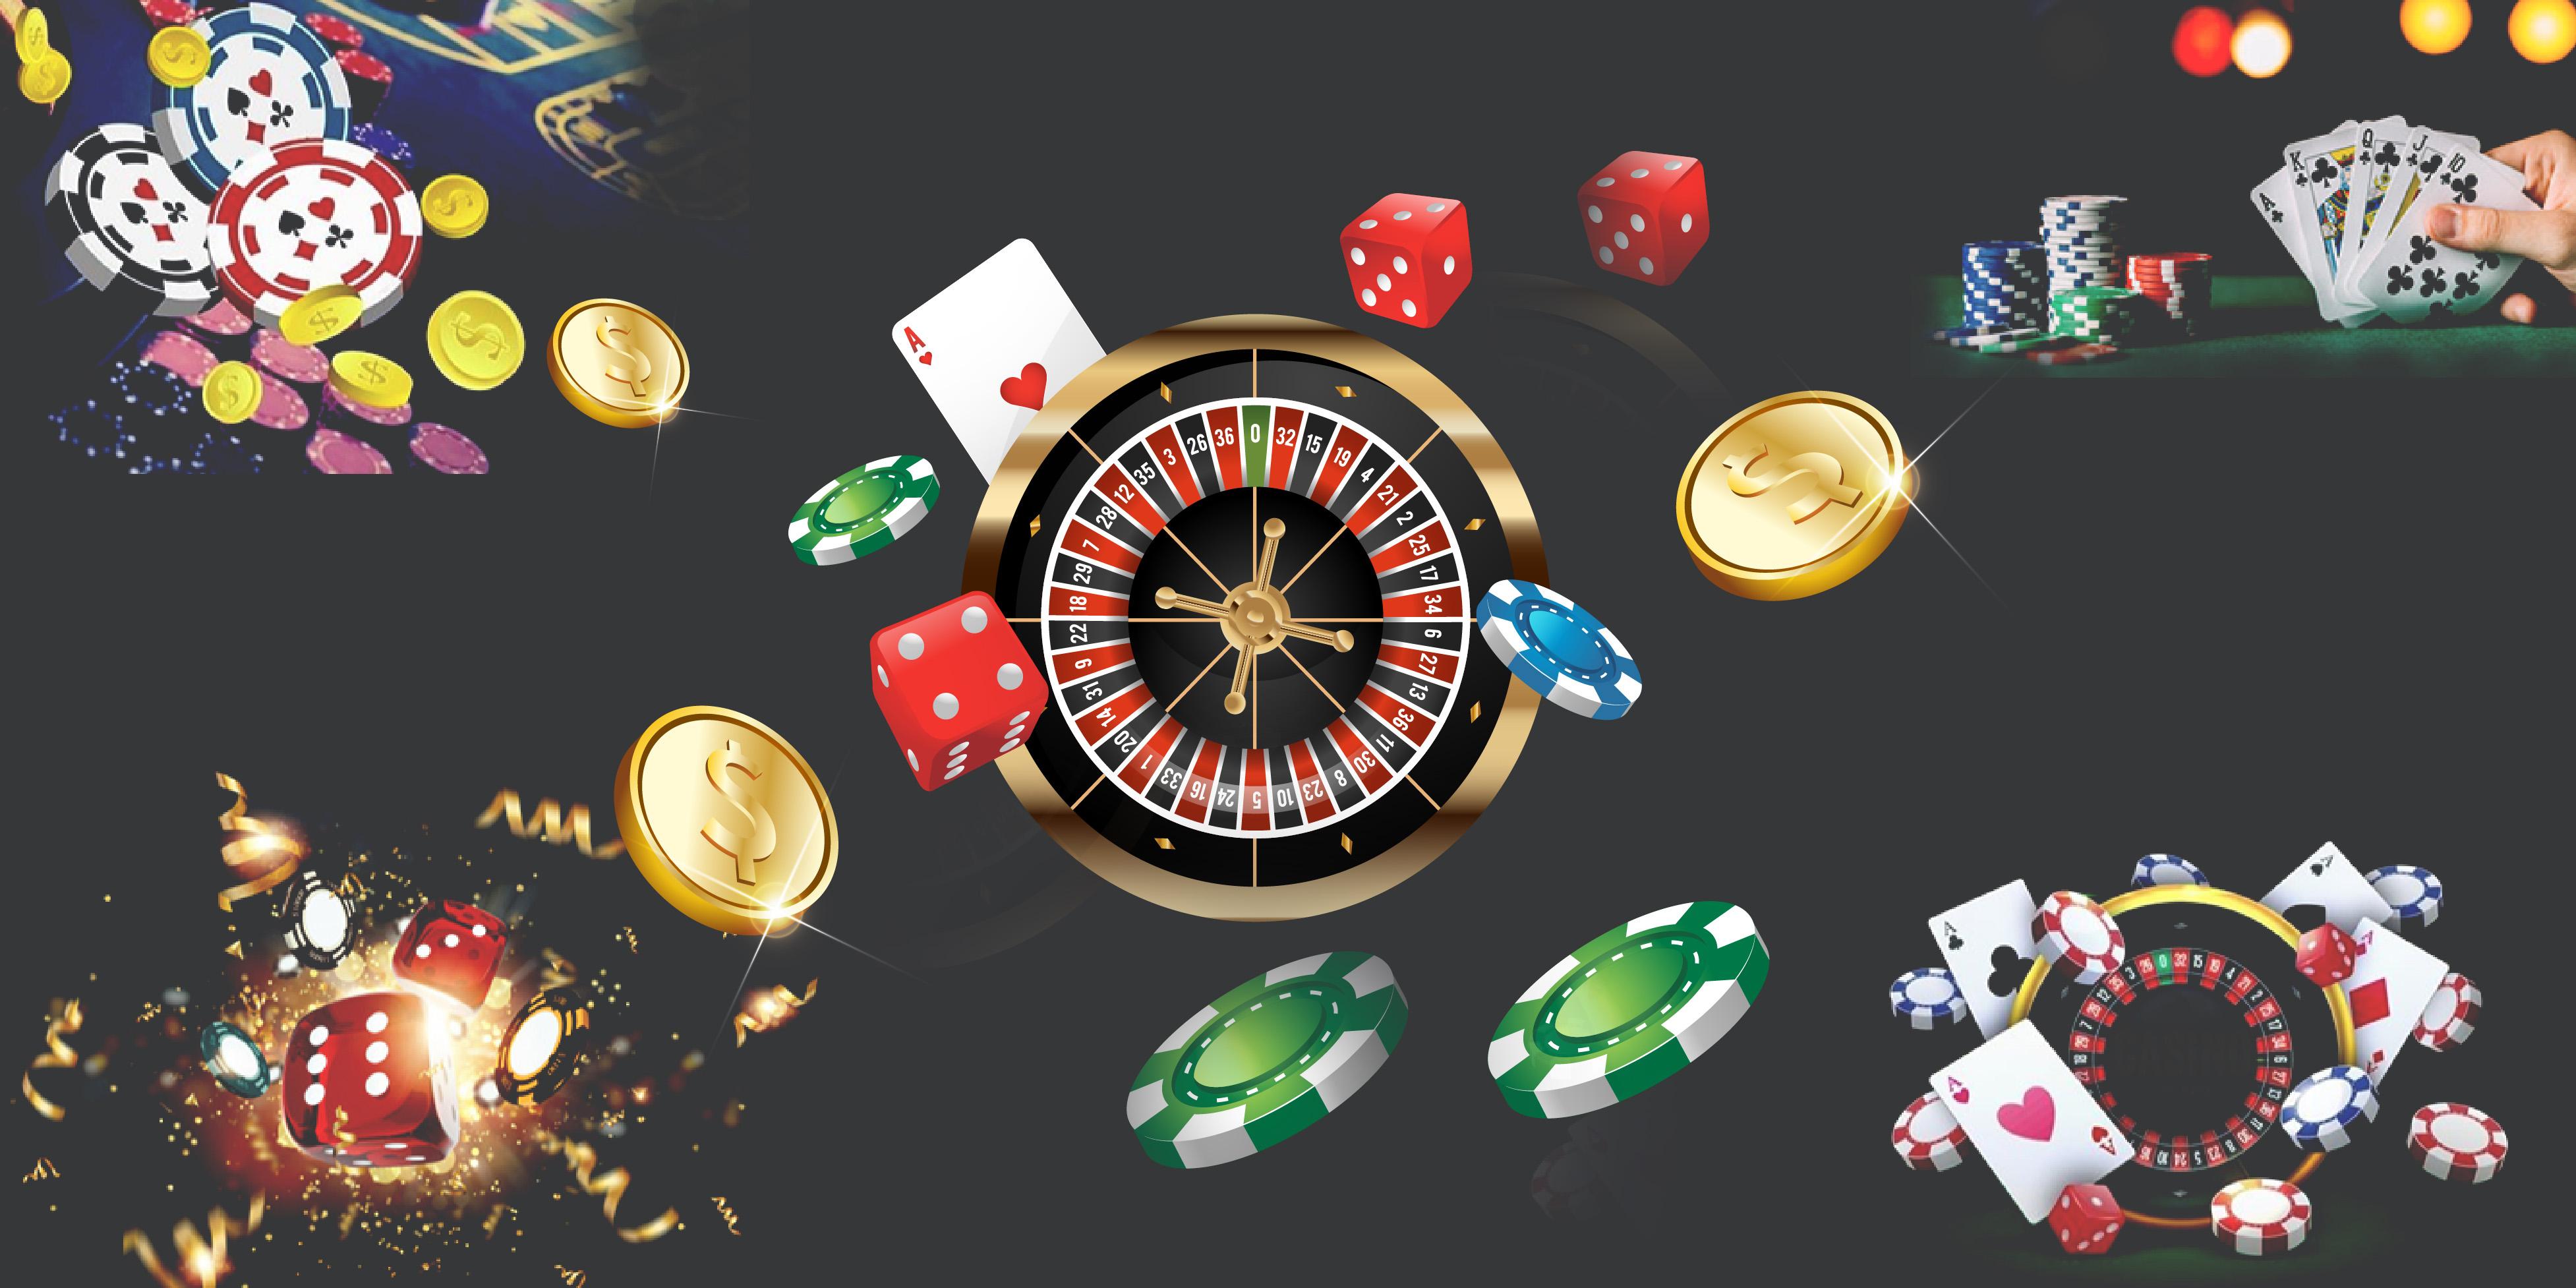 Thailand, Indonesia & Korean-950-Unique PBN Posts,  Poker,  Gambling,  Casino,  Sports & Betting Site